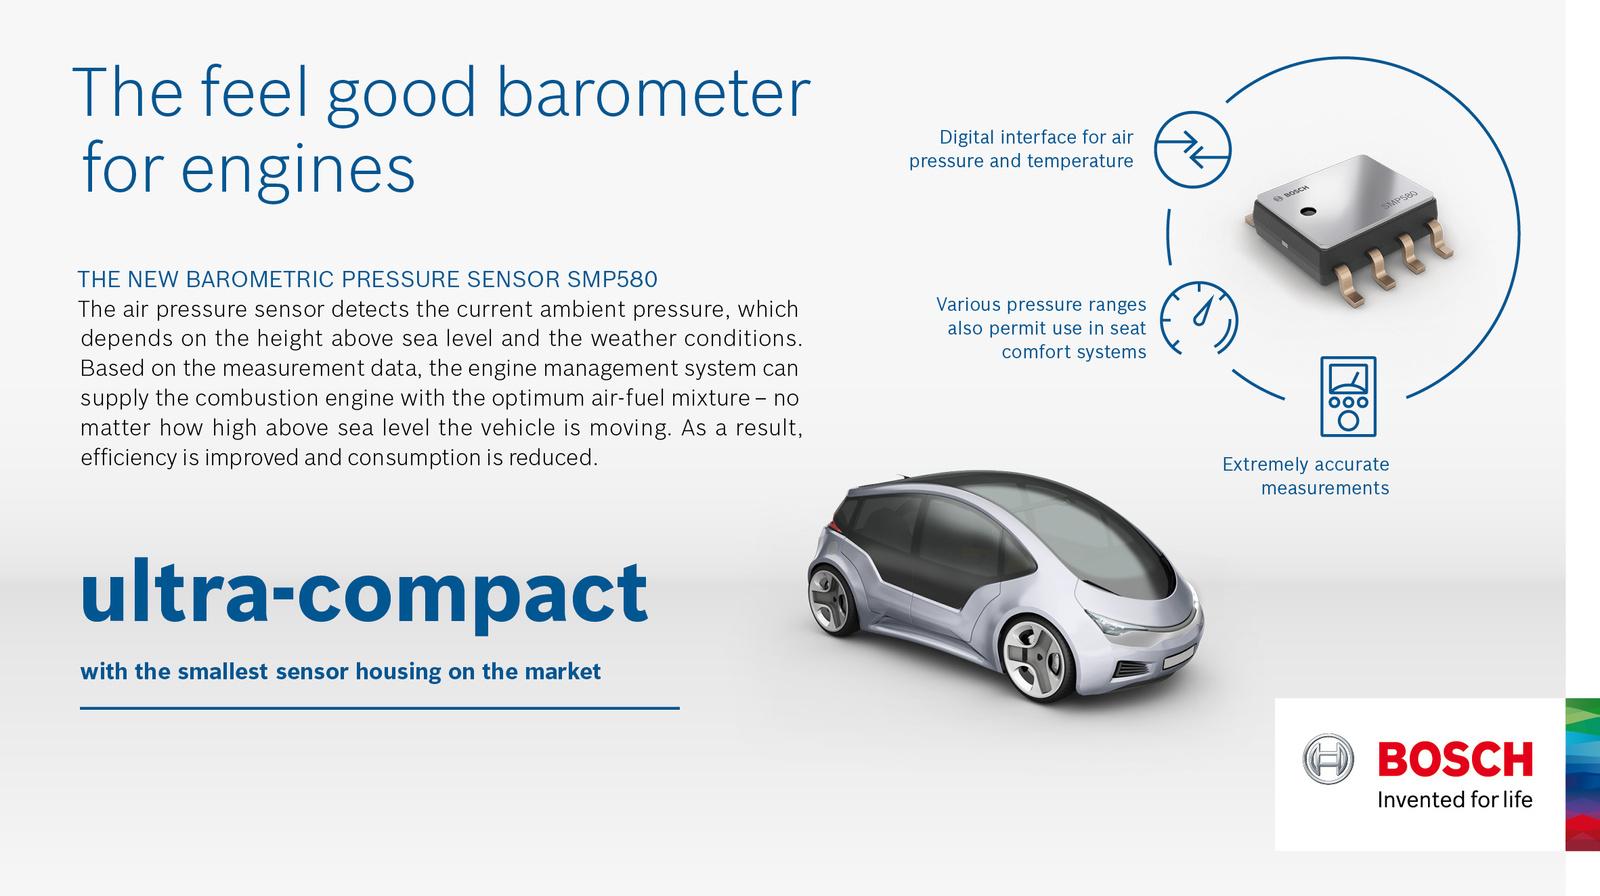 Bosch Sensor Helps Engine Management Systems Reduce Fuel